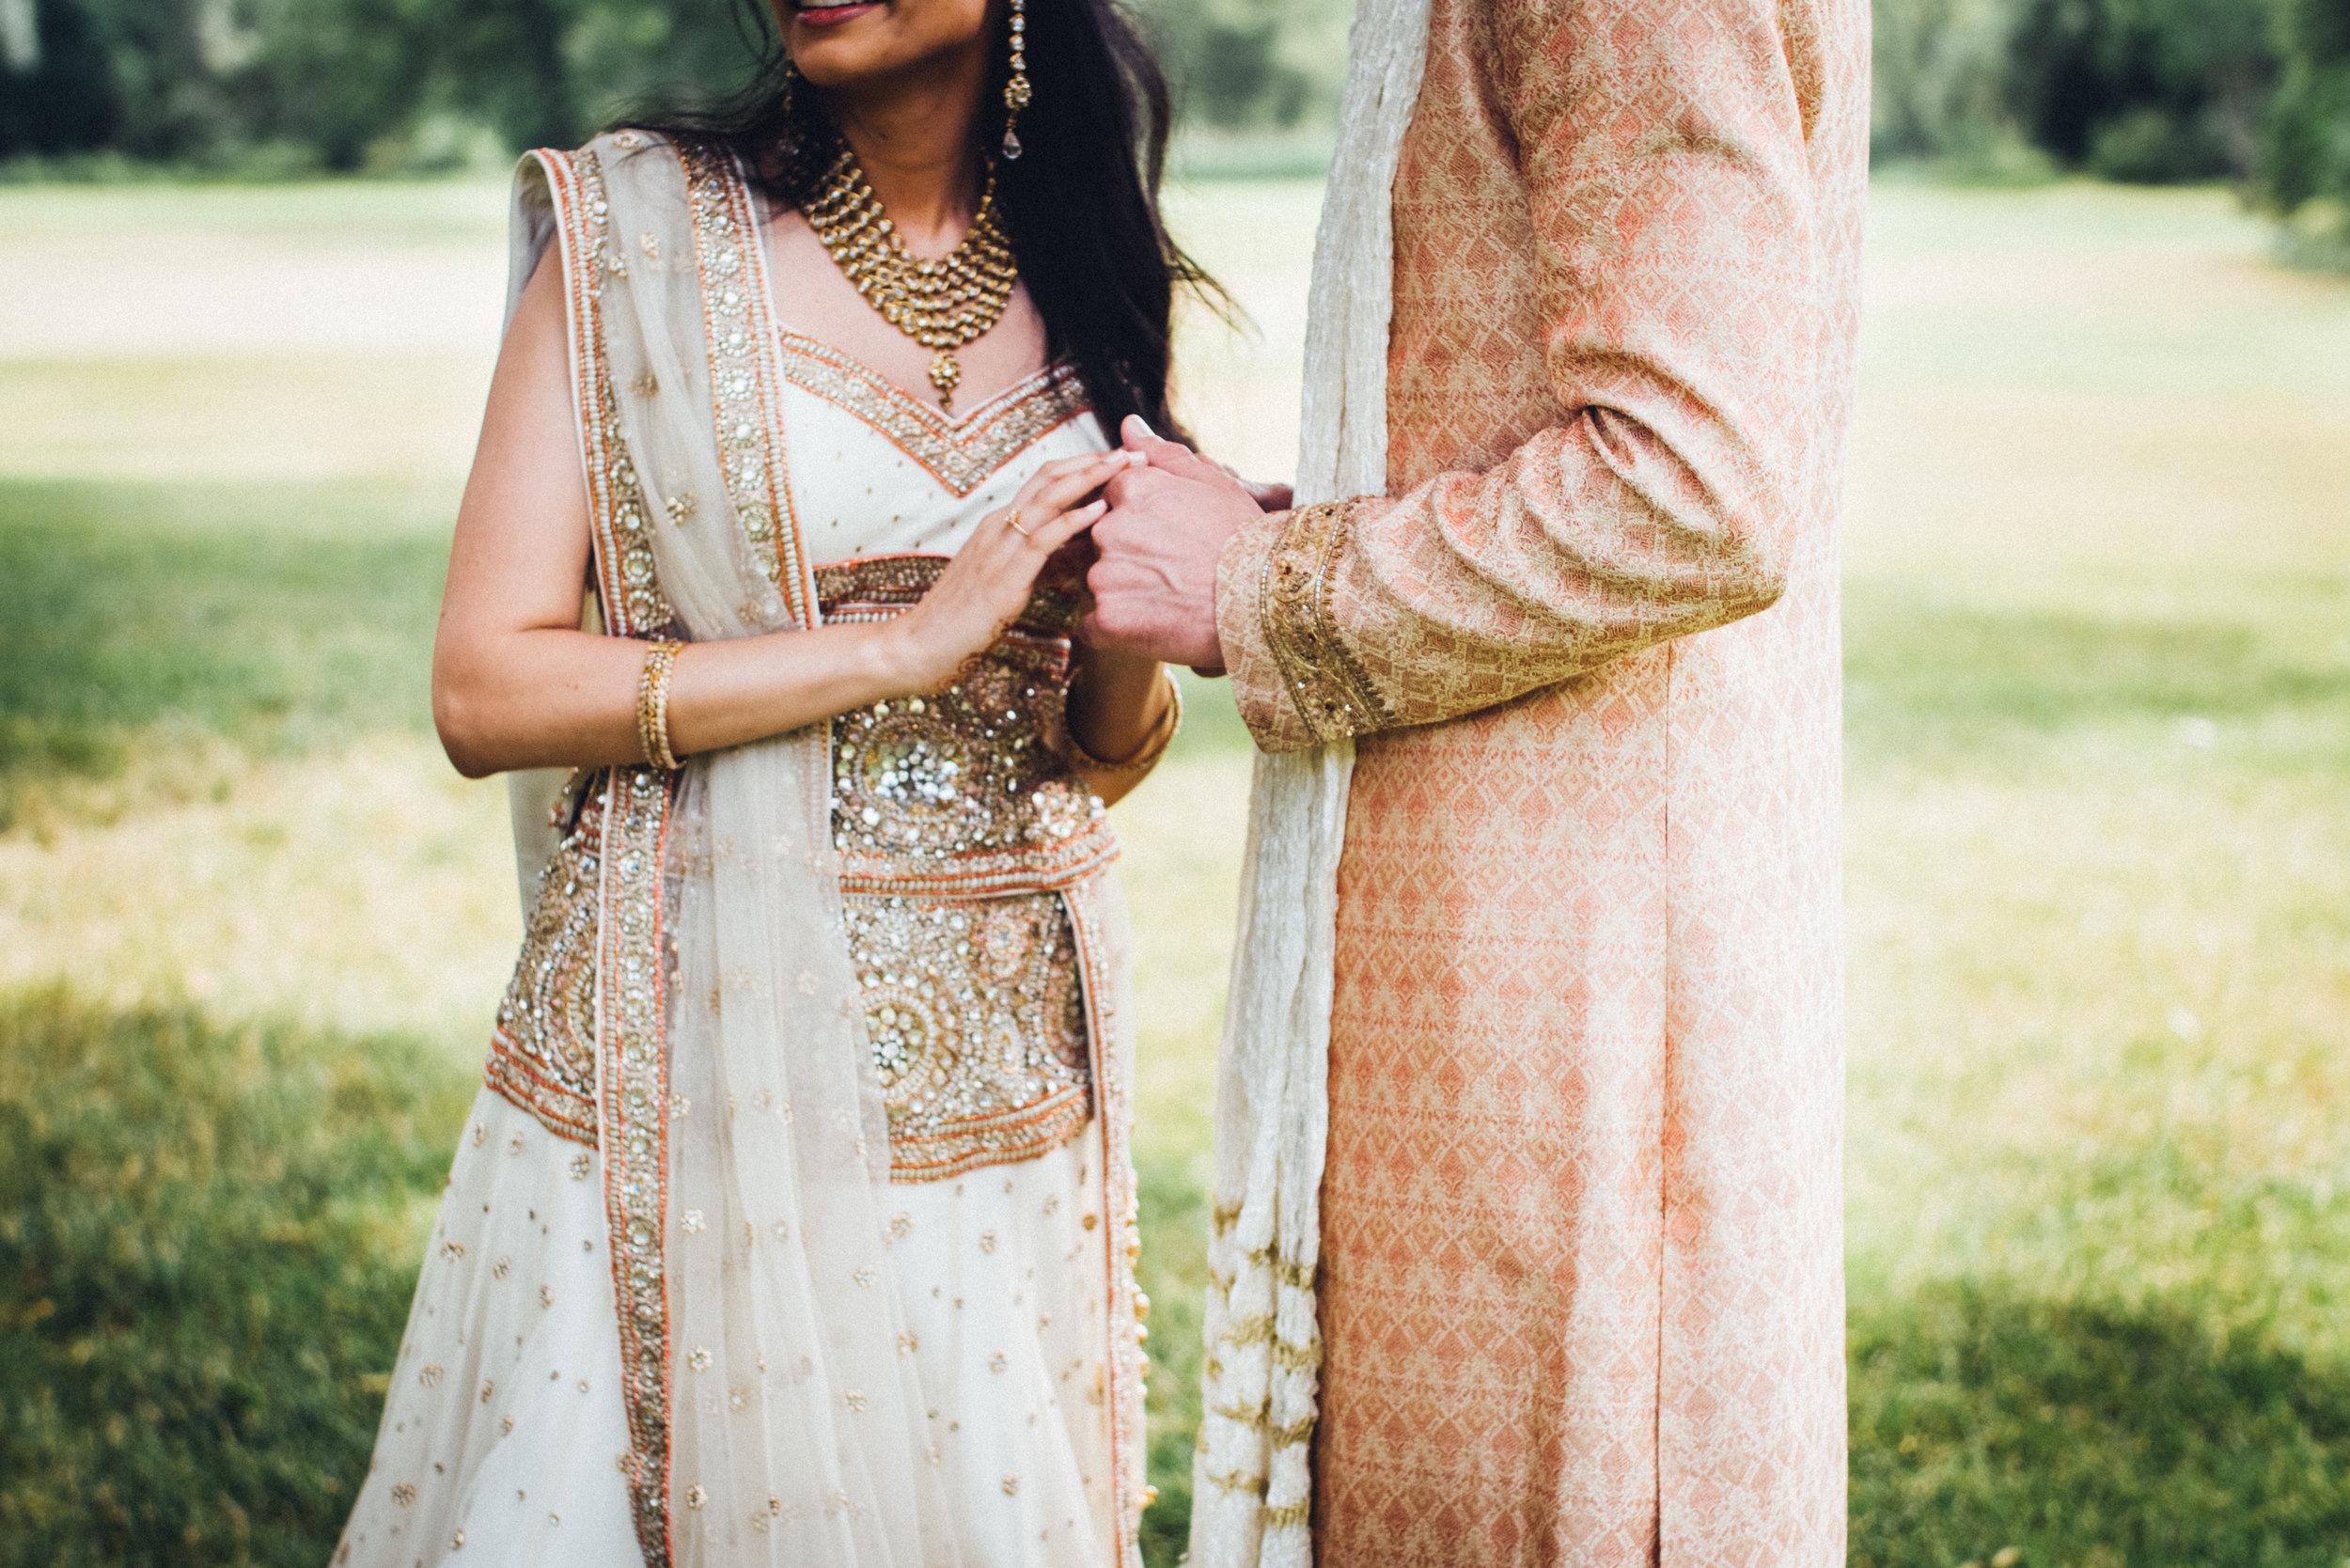 award-winning-wedding-photographer-photographers-photography-detorit-avani-khristoph-becker-bhatt-shadow-shine-pictures-michigan